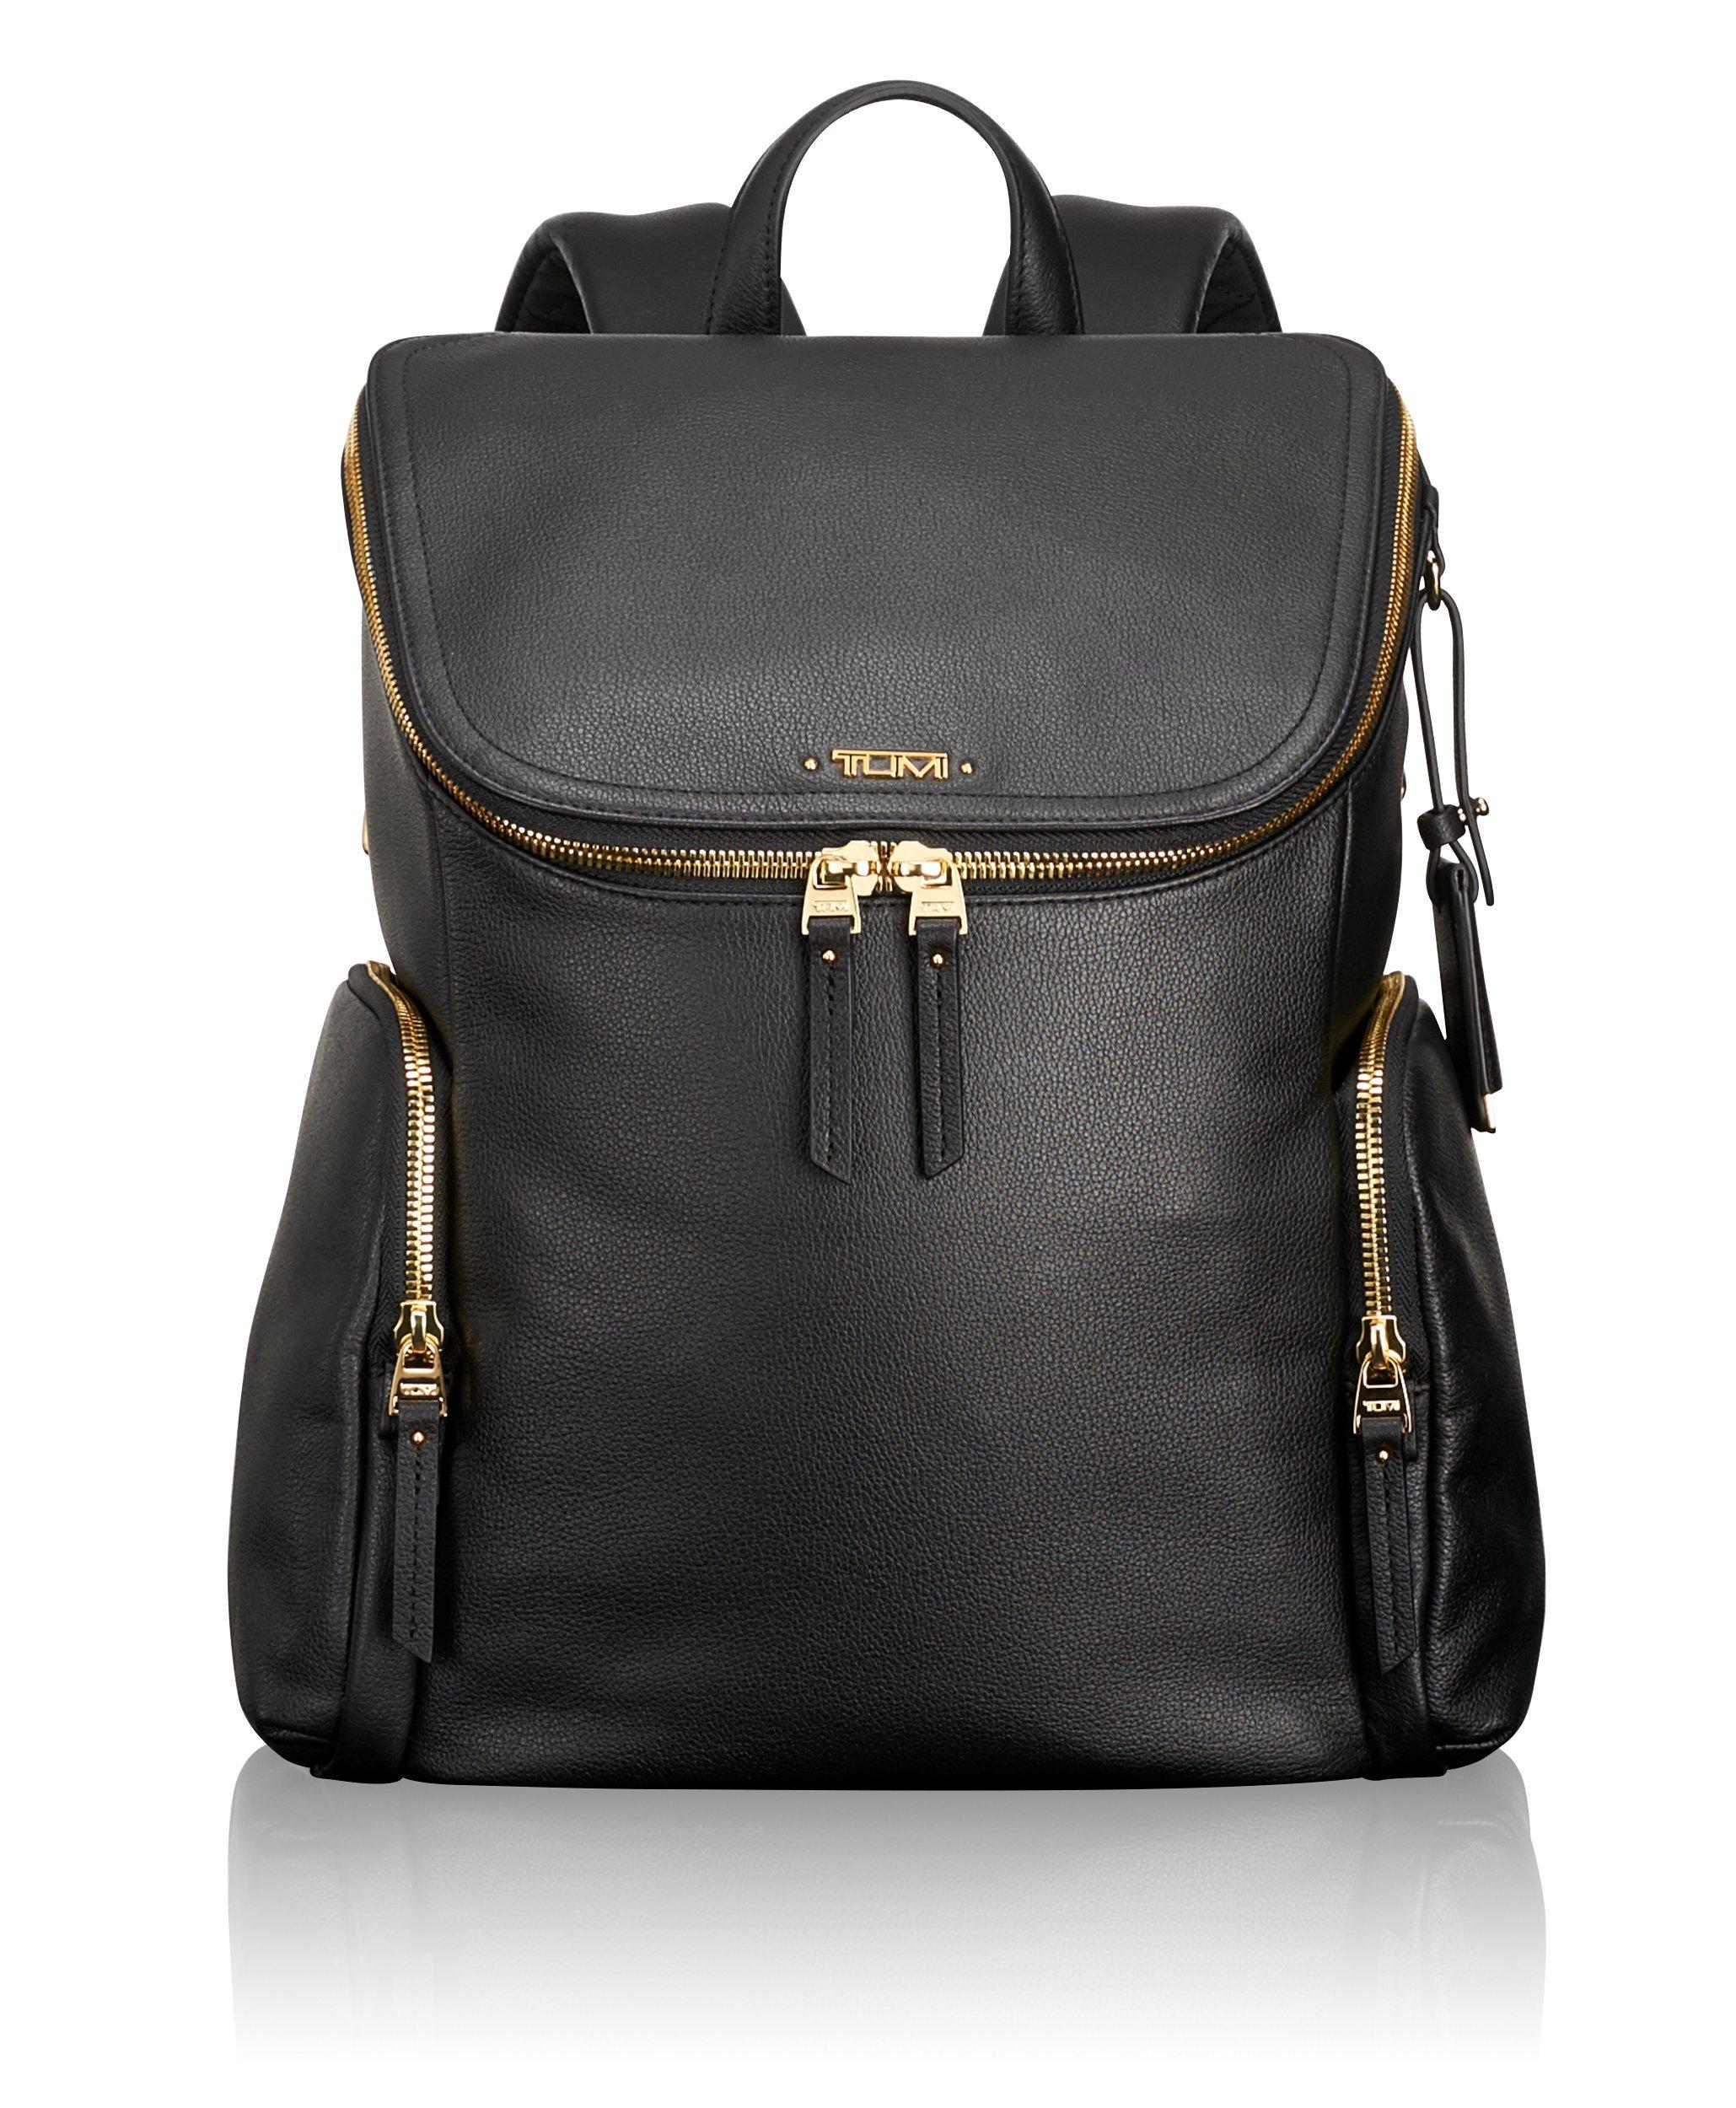 Tumi Women's Voyageur Lexa Zip Flap Backpack, Black One Size